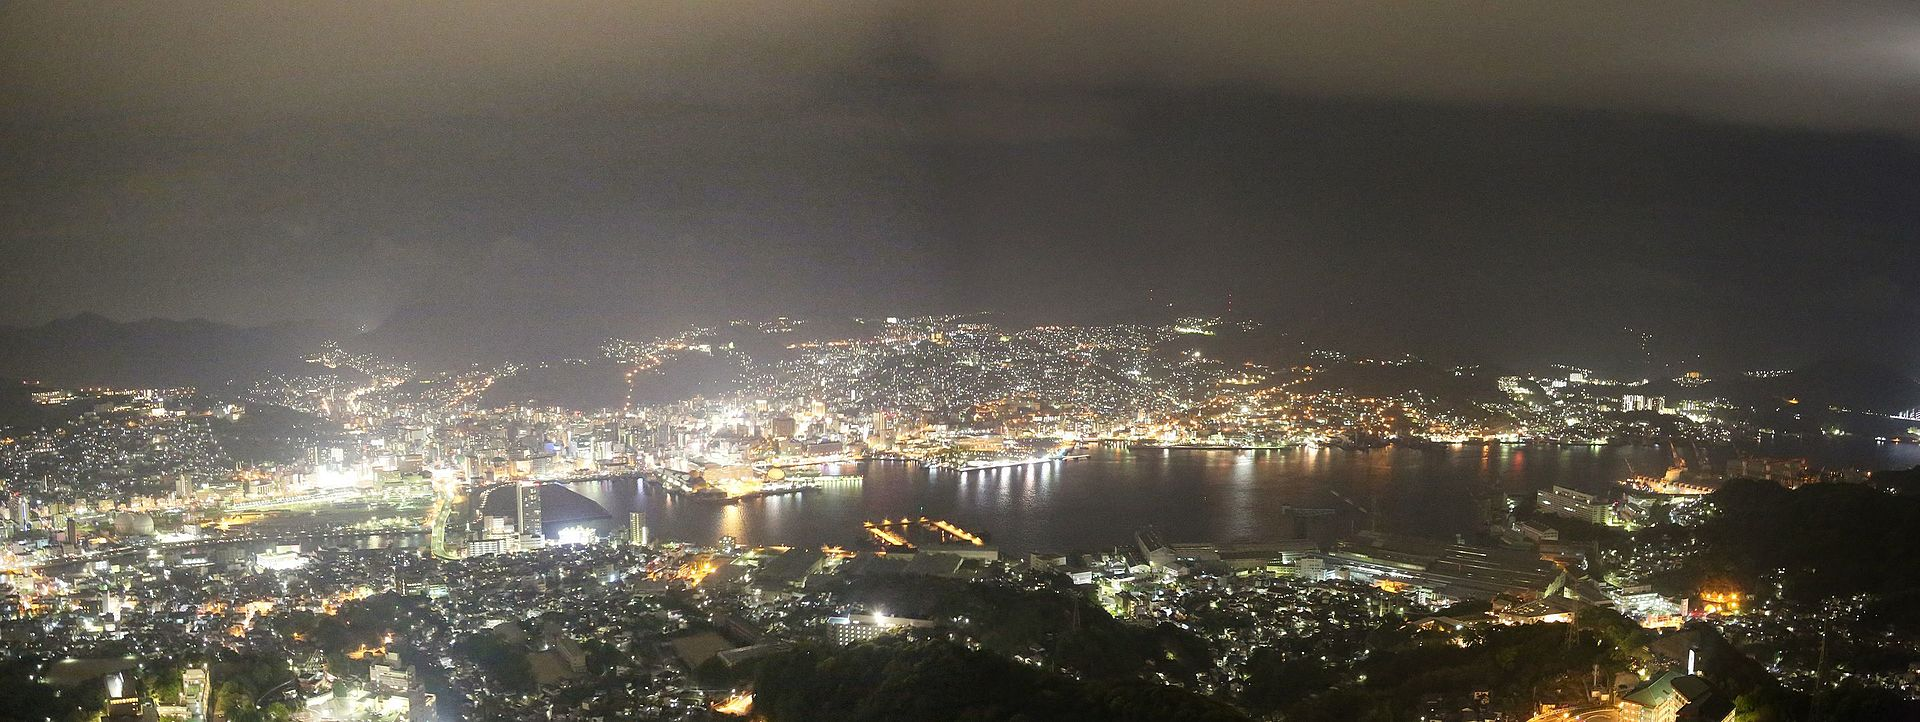 inasamachi,_nagasaki,_nagasaki_prefecture_852-8011,_japan_-_panoramio